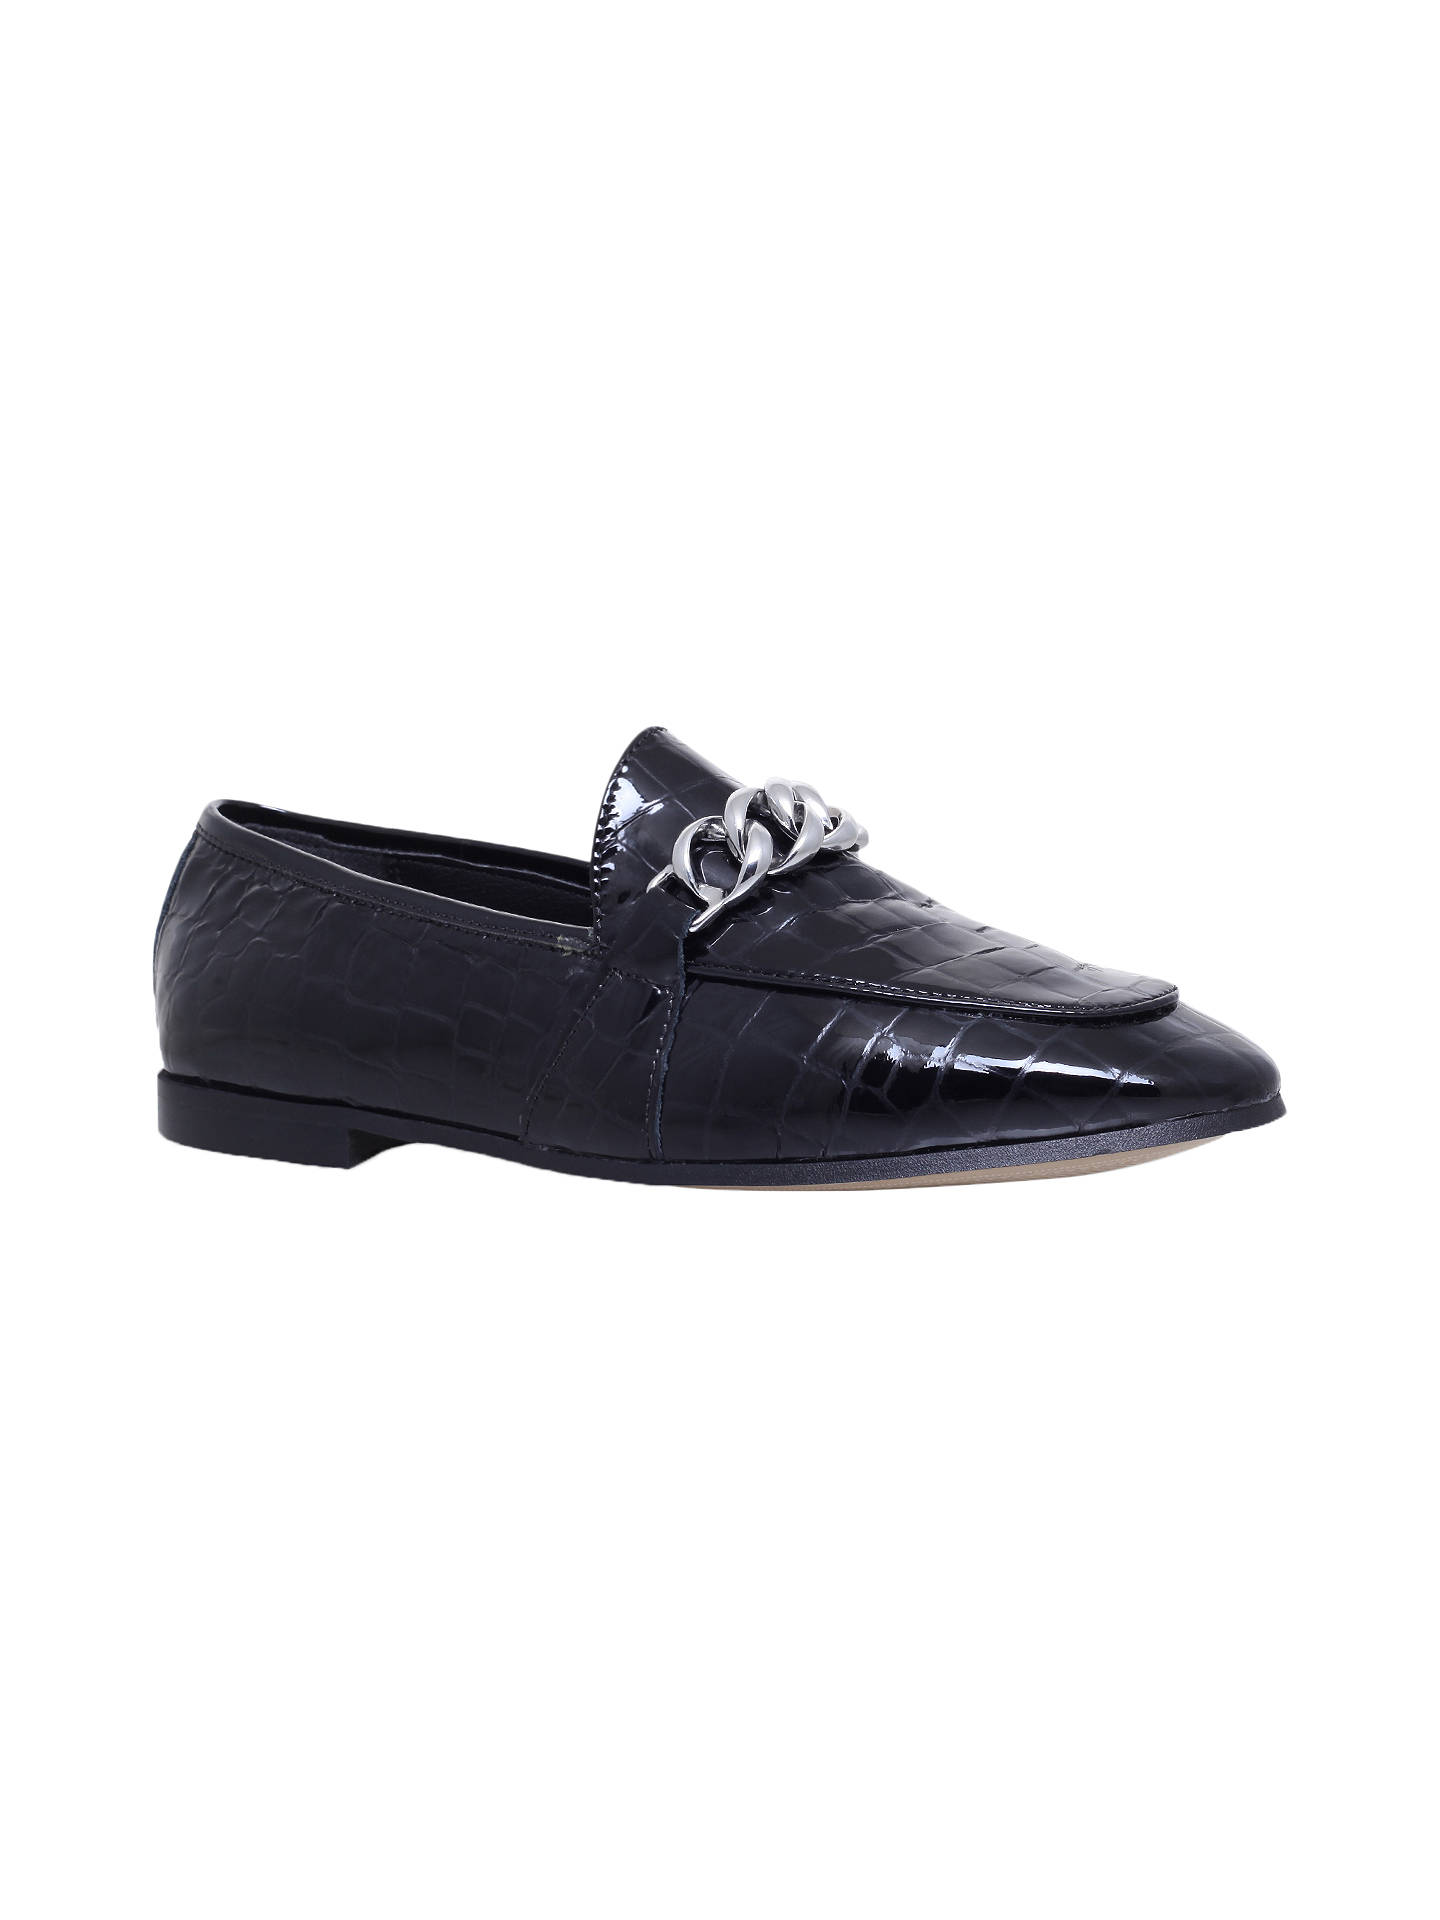 c361e279895 Buy KG by Kurt Geiger Kenzie Chain Loafers